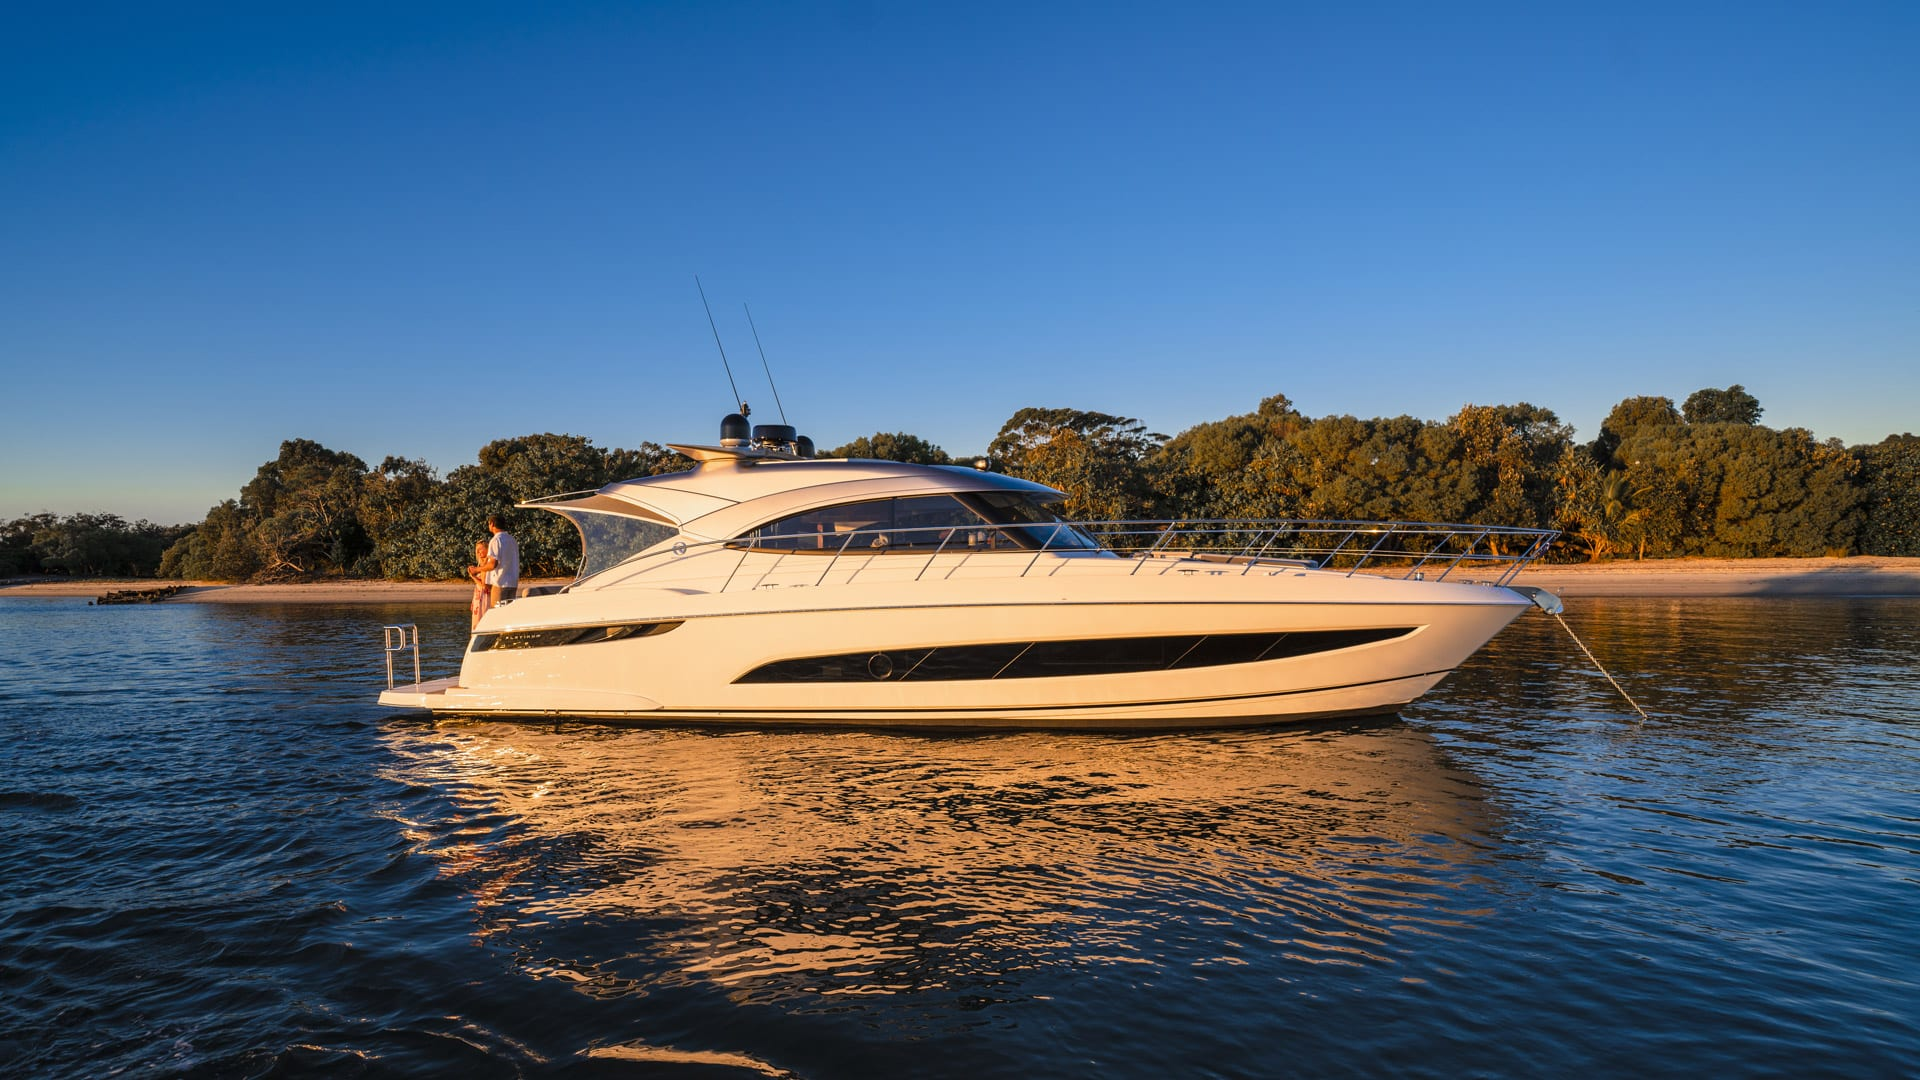 Riviera-4800-Sport-Yacht-Series-II-Platinum-Edition-Lifestyle-05